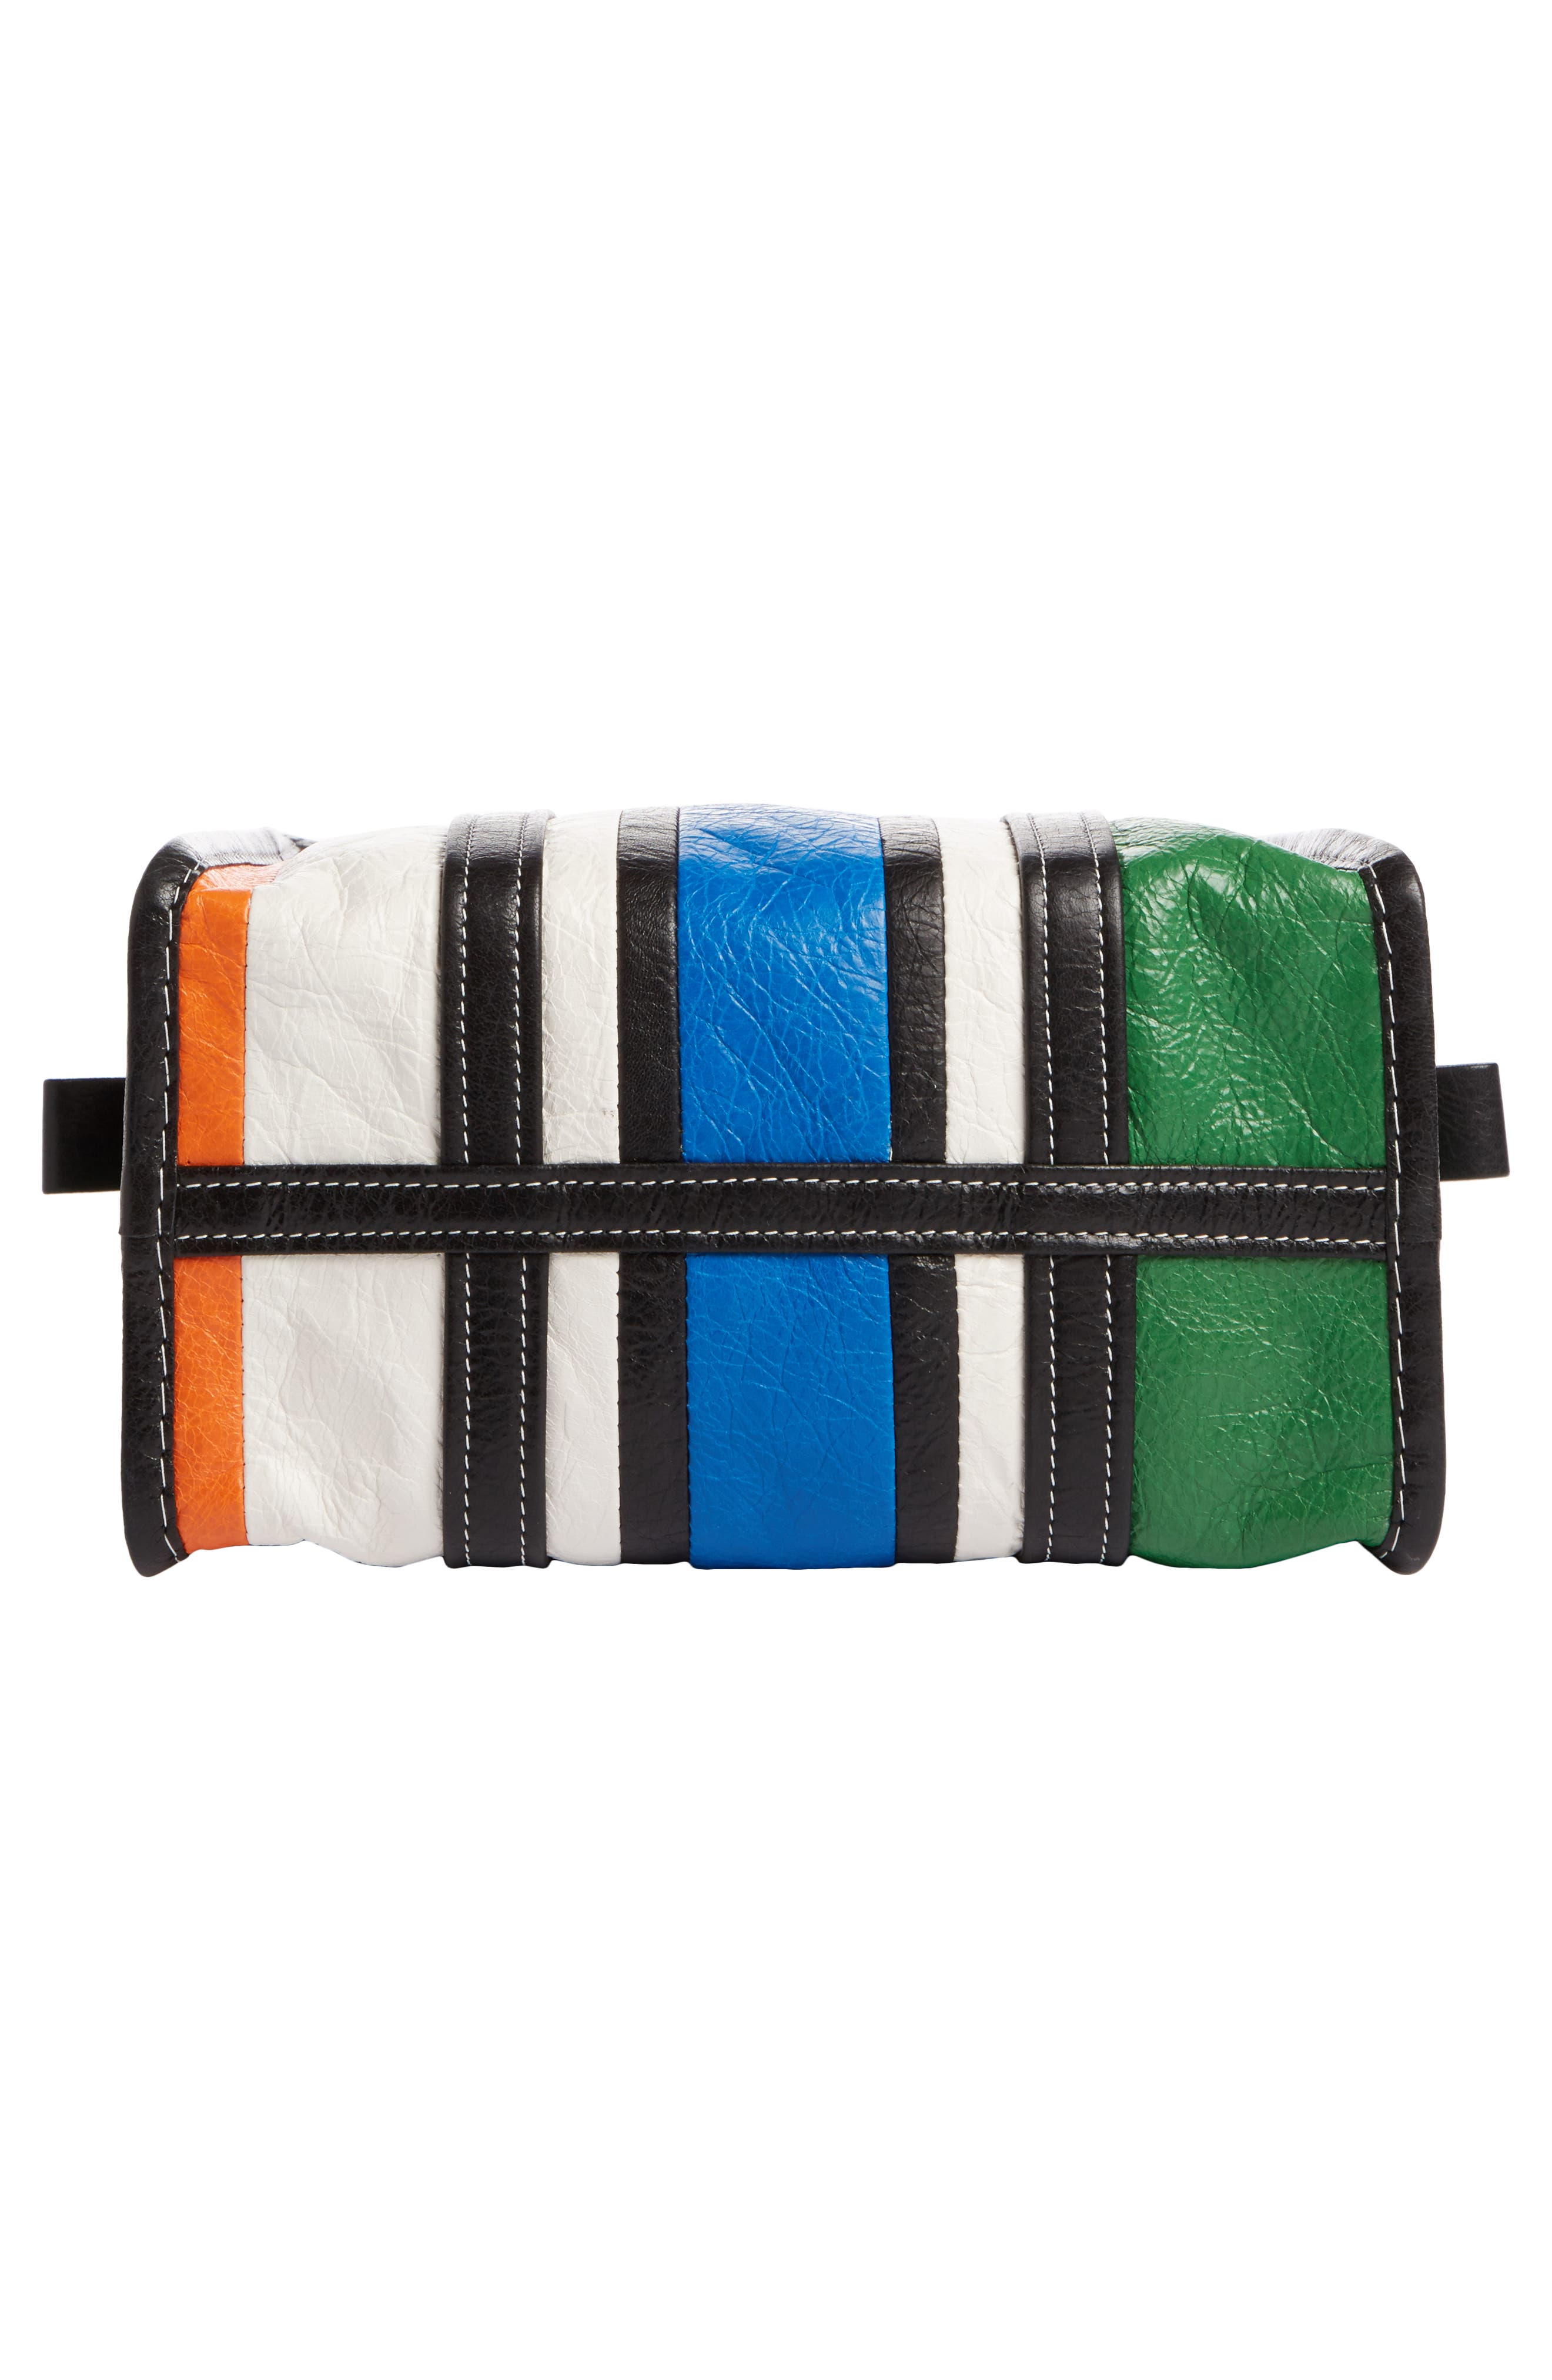 Extra Small Bazar Leather Shopper,                             Alternate thumbnail 4, color,                             Orange/ Blue/ Vert/ Navy